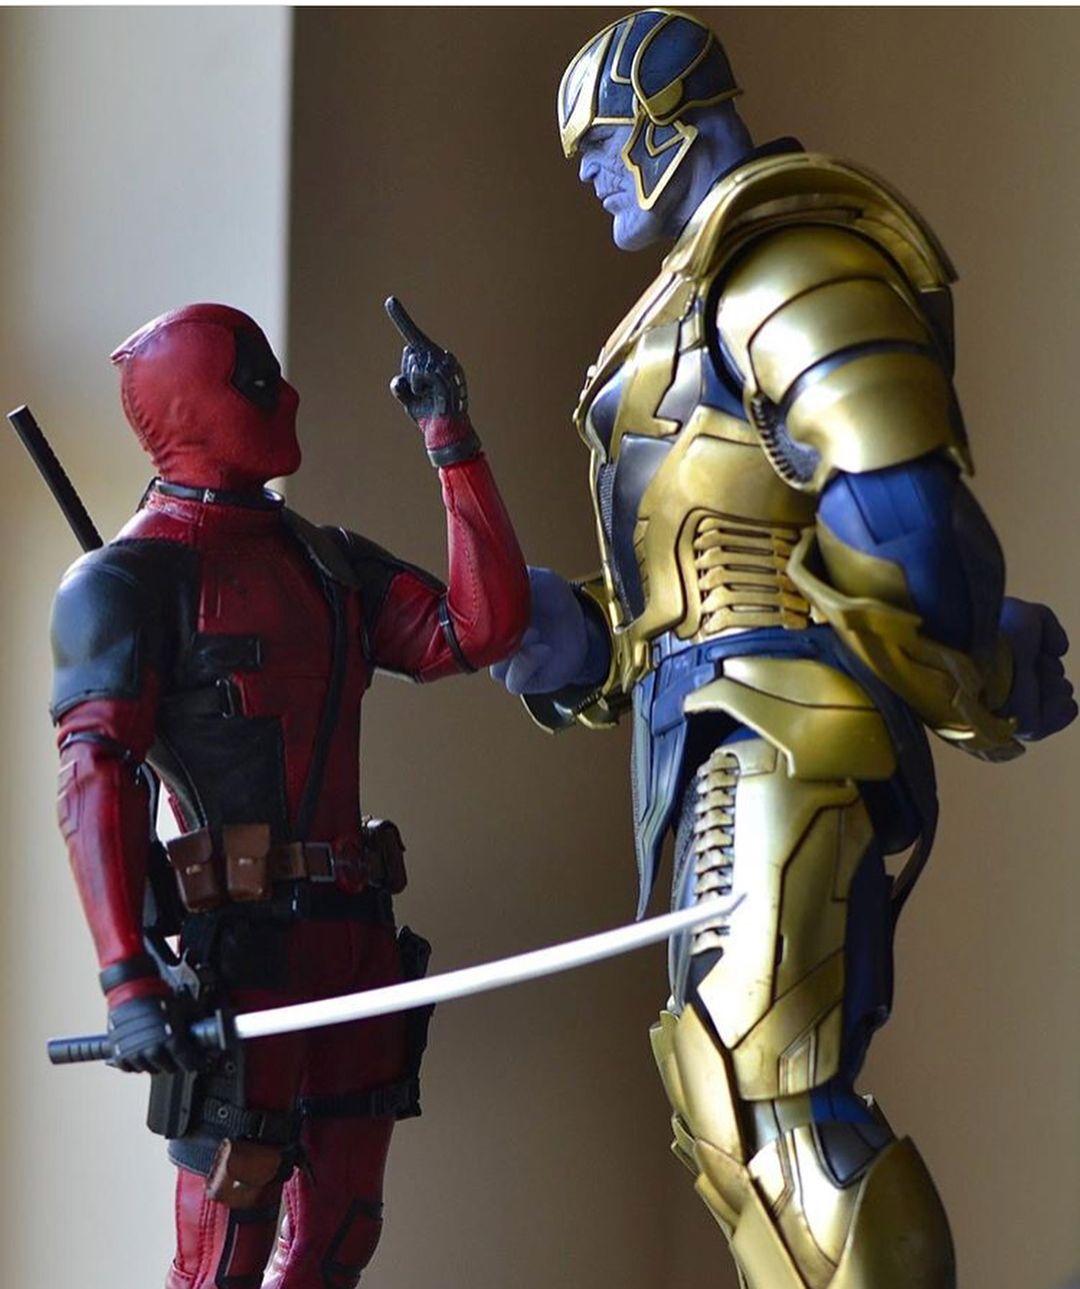 269fe1af Big balls of fire #deadpool #ironman #avengers #dc #marvel #spiderman  #bodybuilding #gymlife #crossfit #batman #justiceleague…